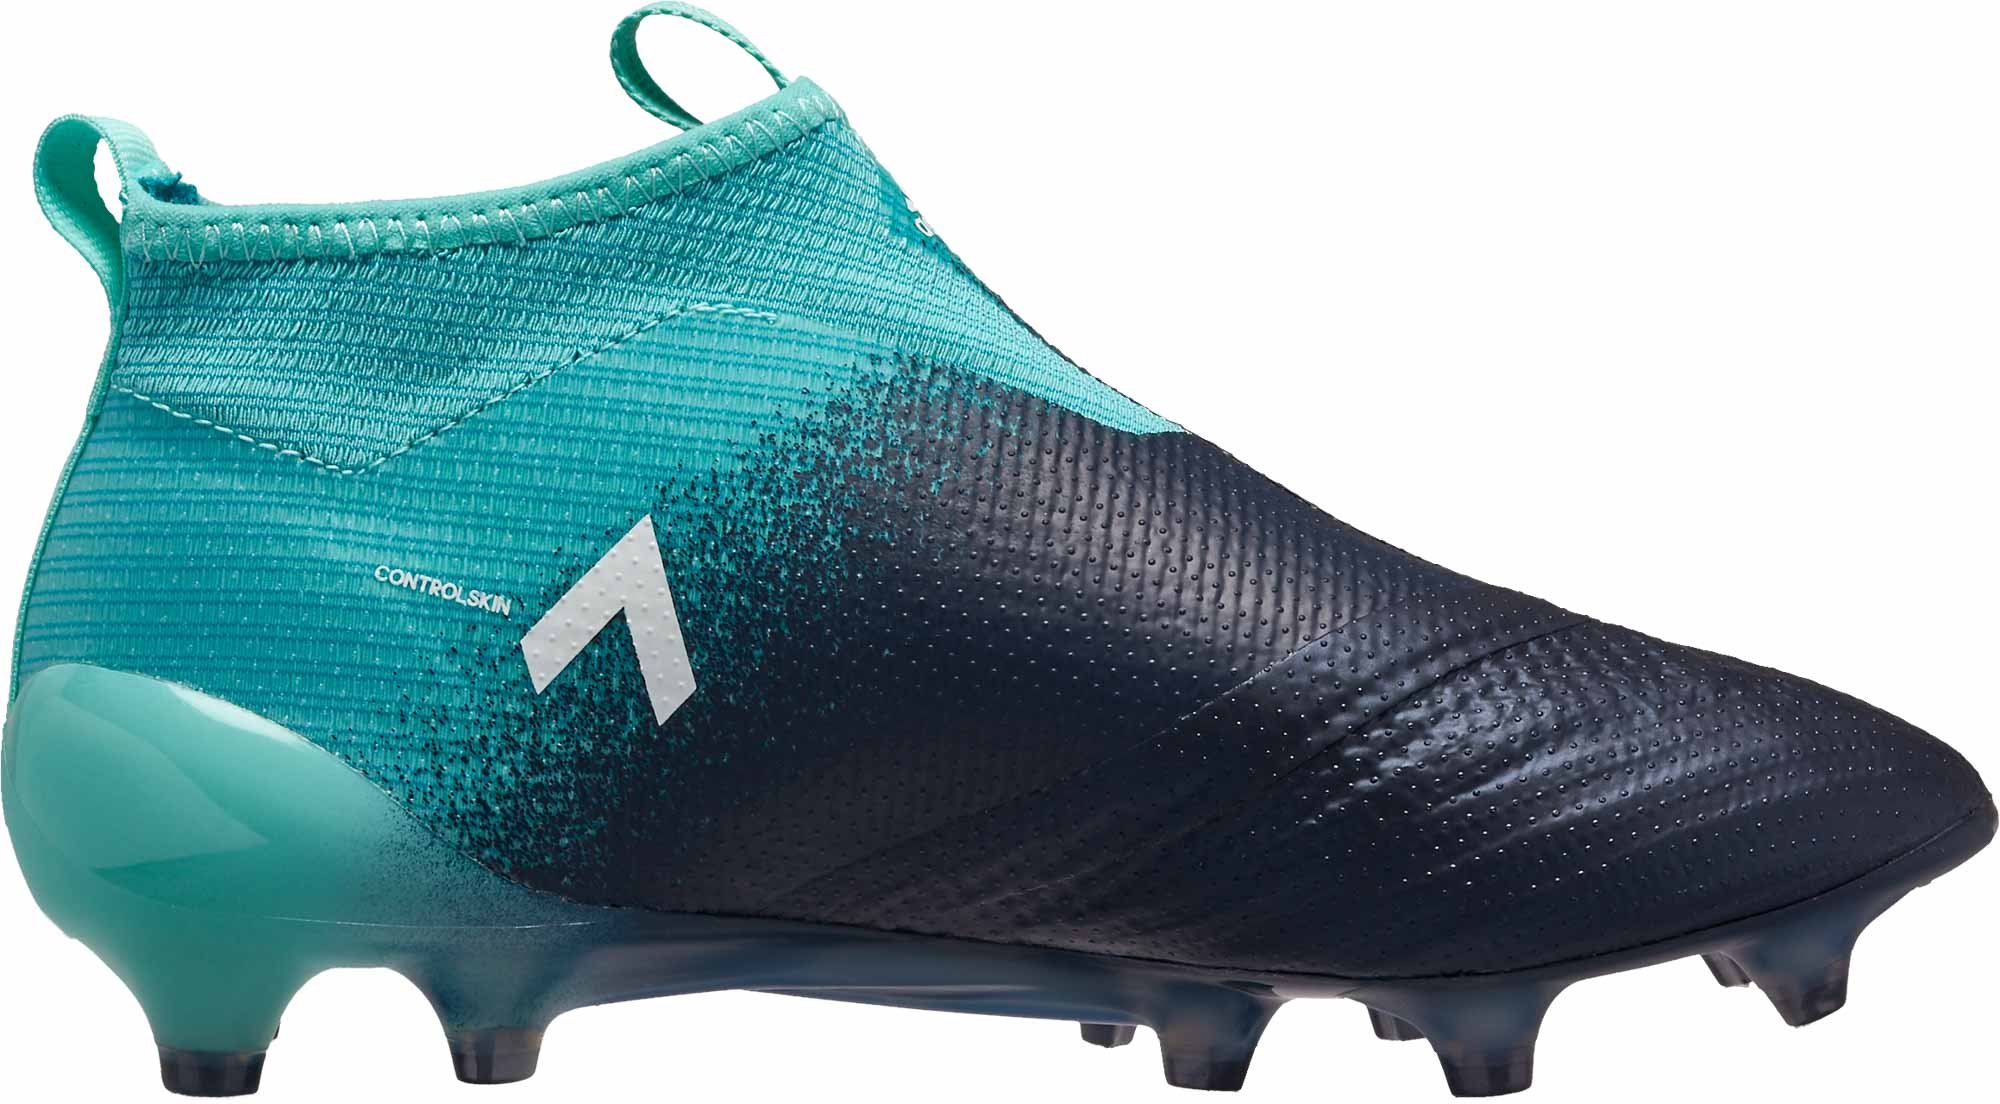 39adb00ec adidas Kids ACE 17+ Purecontrol FG Soccer Cleats - Energy Aqua ...